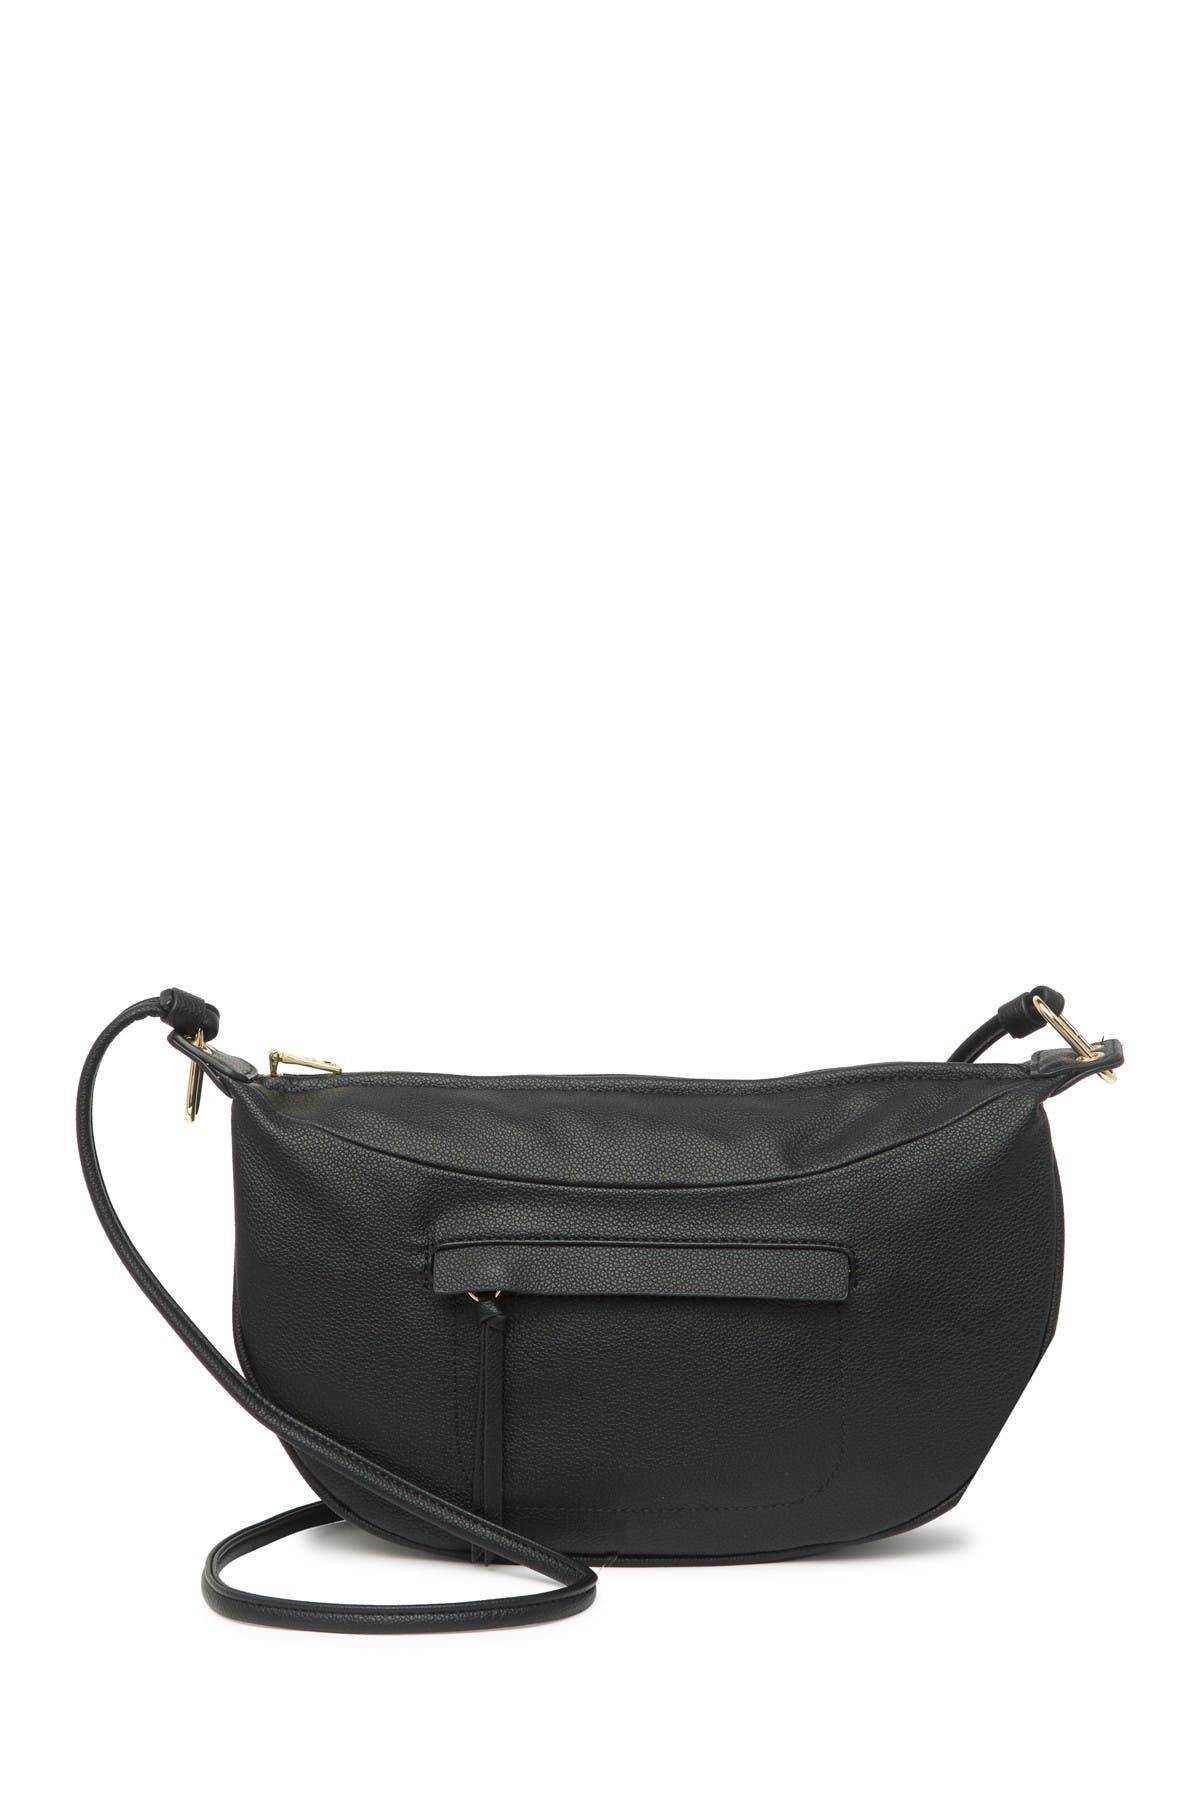 Image of Steve Madden Sadie Soft Crossbody Bag